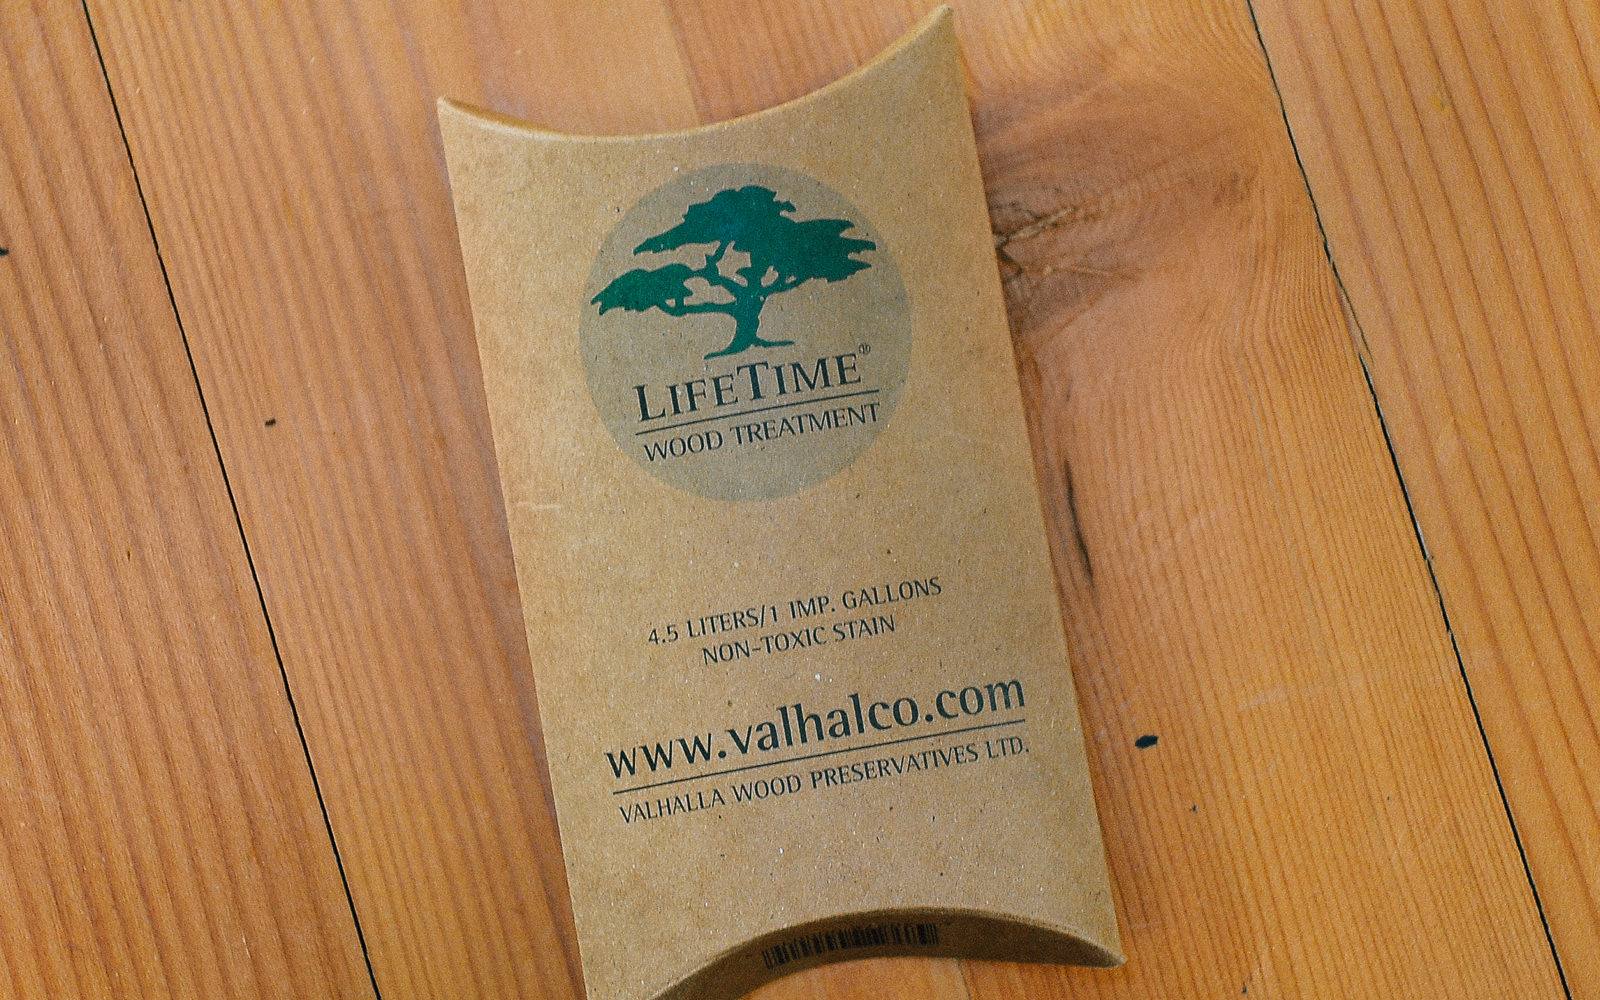 lifetime wood treatment